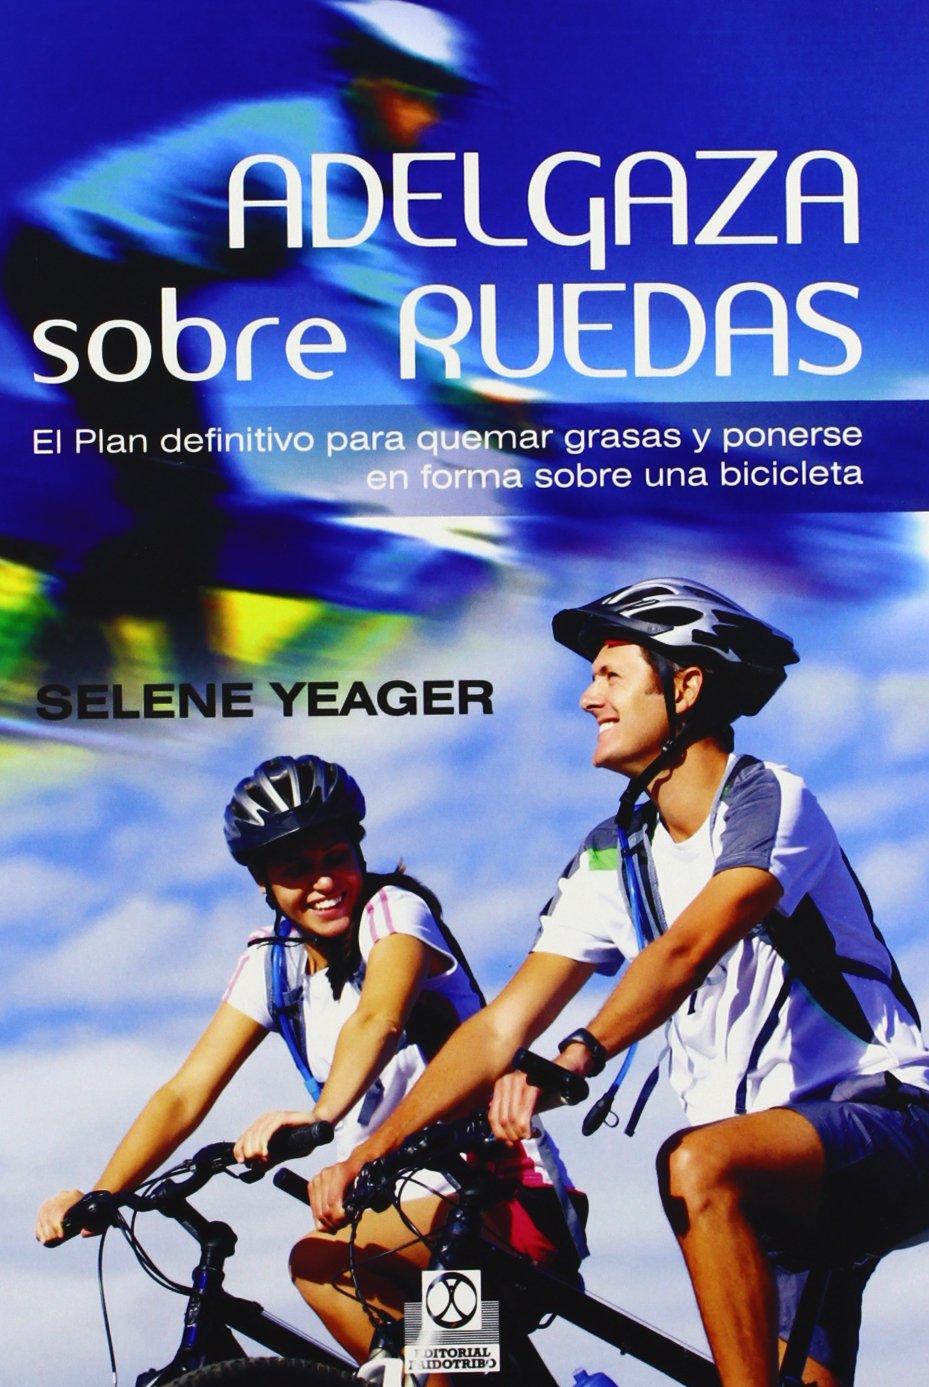 ADELGAZA SOBRE RUEDAS, EL PLAN DEFINITIVO PARA QUEMAR GRASAS (Spanish Edition) (Spanish) Paperback – November 30, 2012